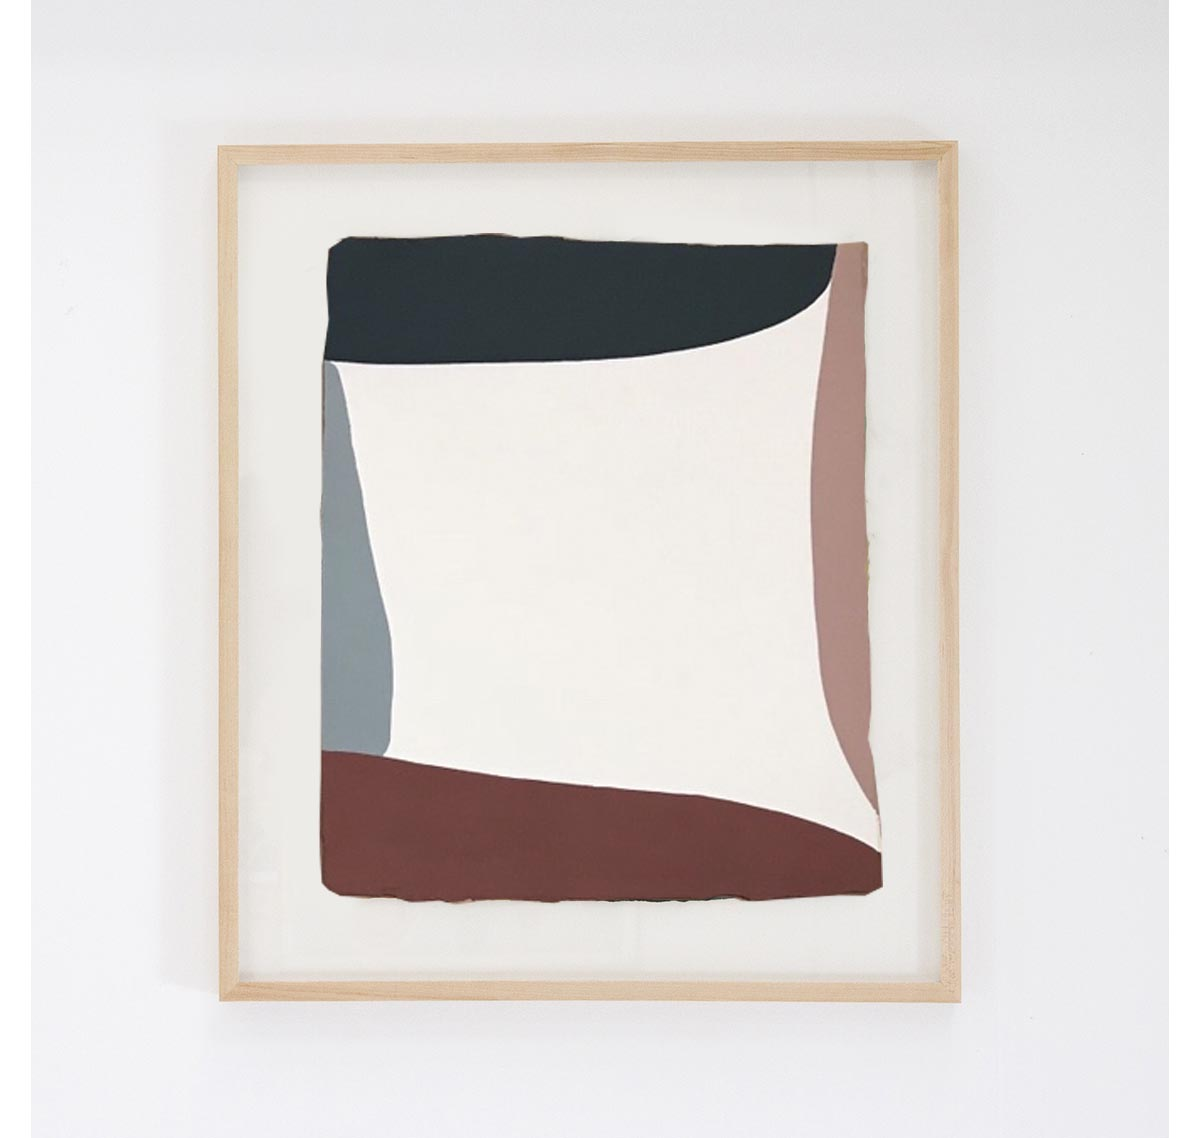 claudia valsells arte abstracto contemporaneo sober papel